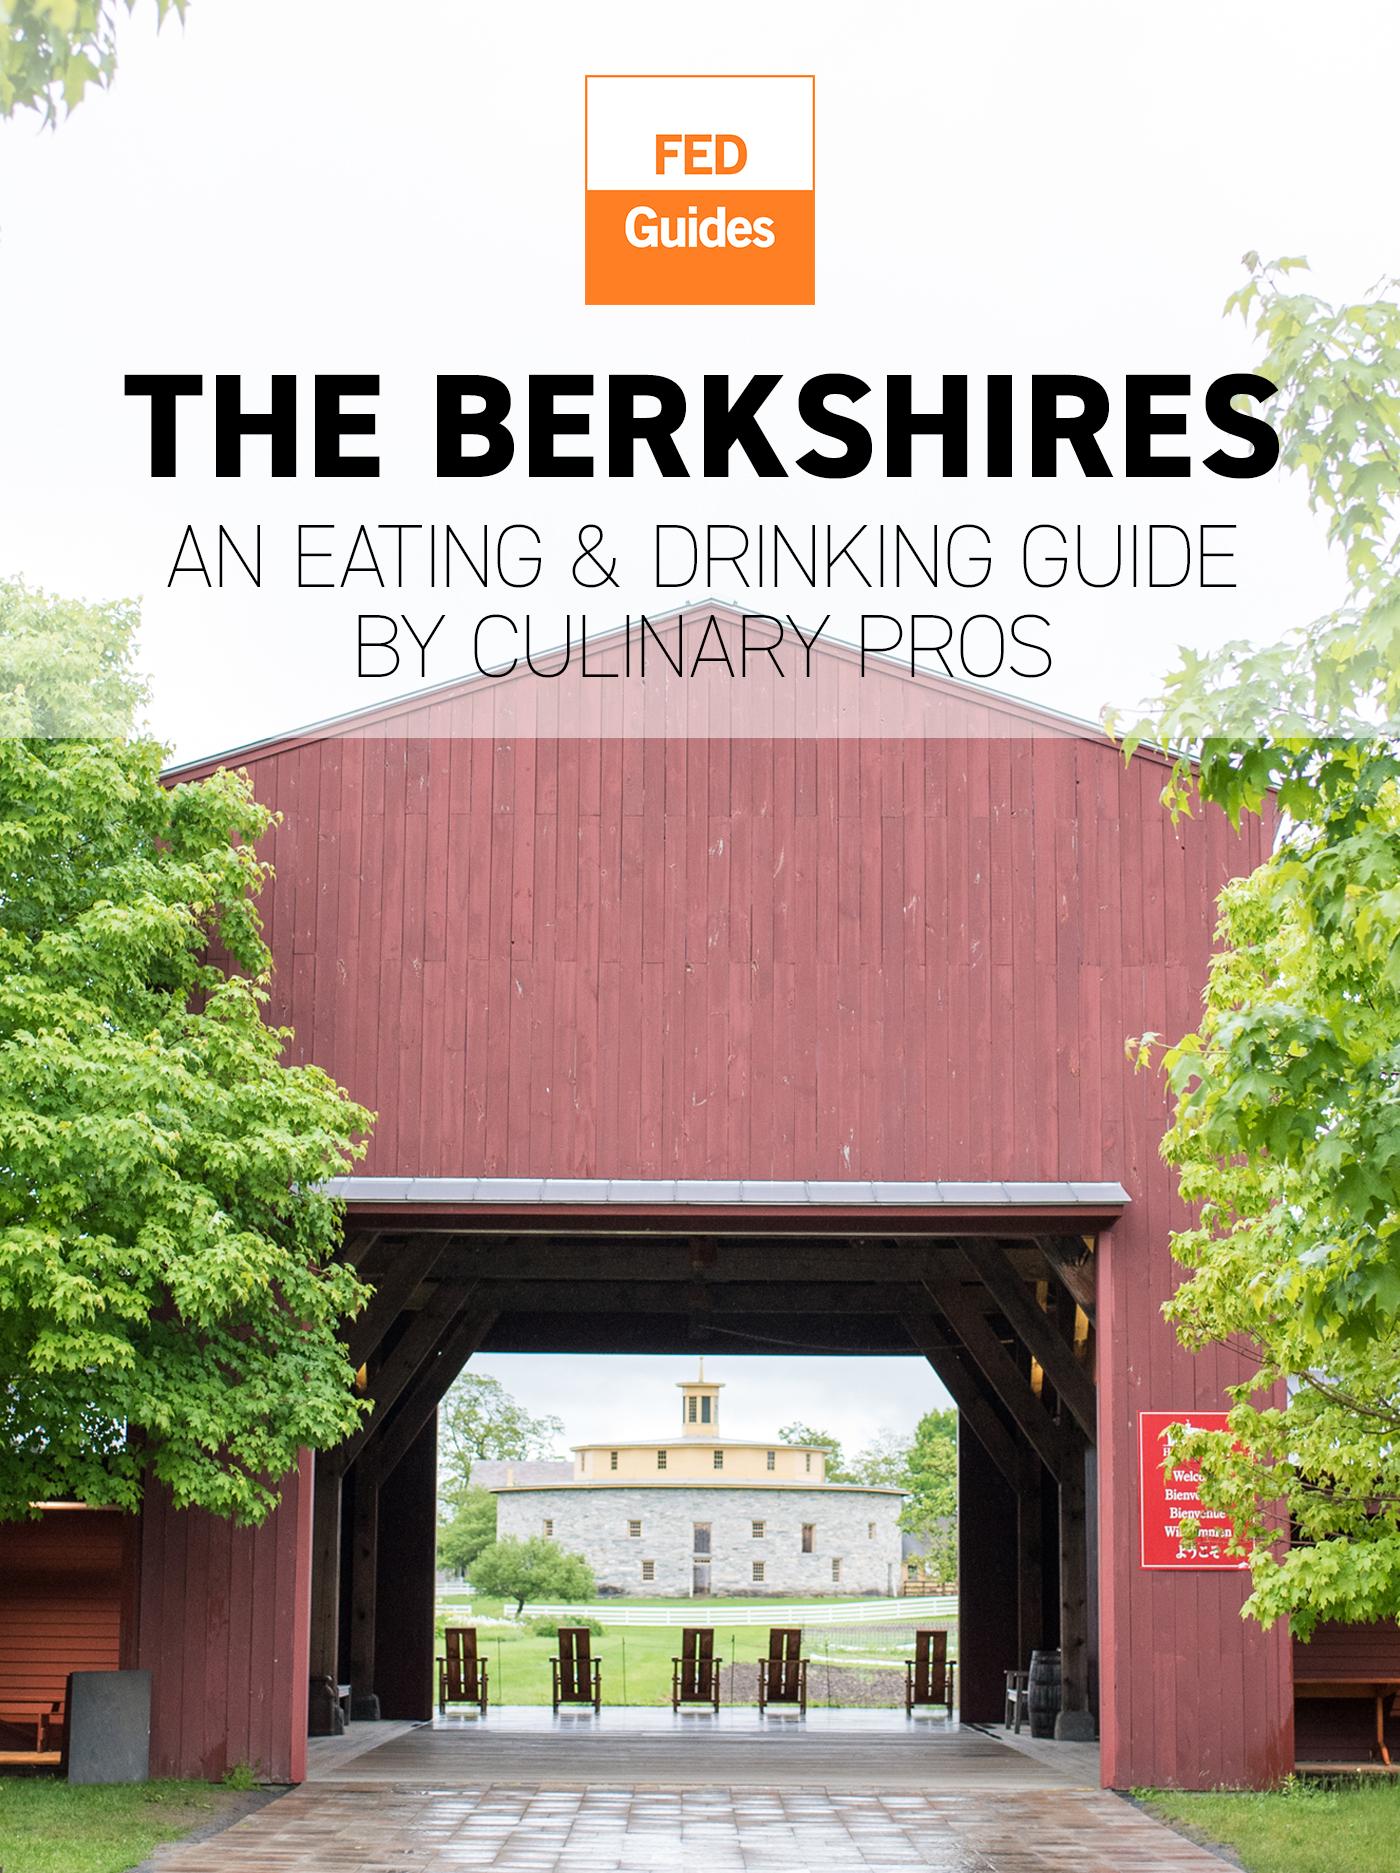 USA_MA_Berkshires_eBook_Apple_Cover_v4.5.jpg